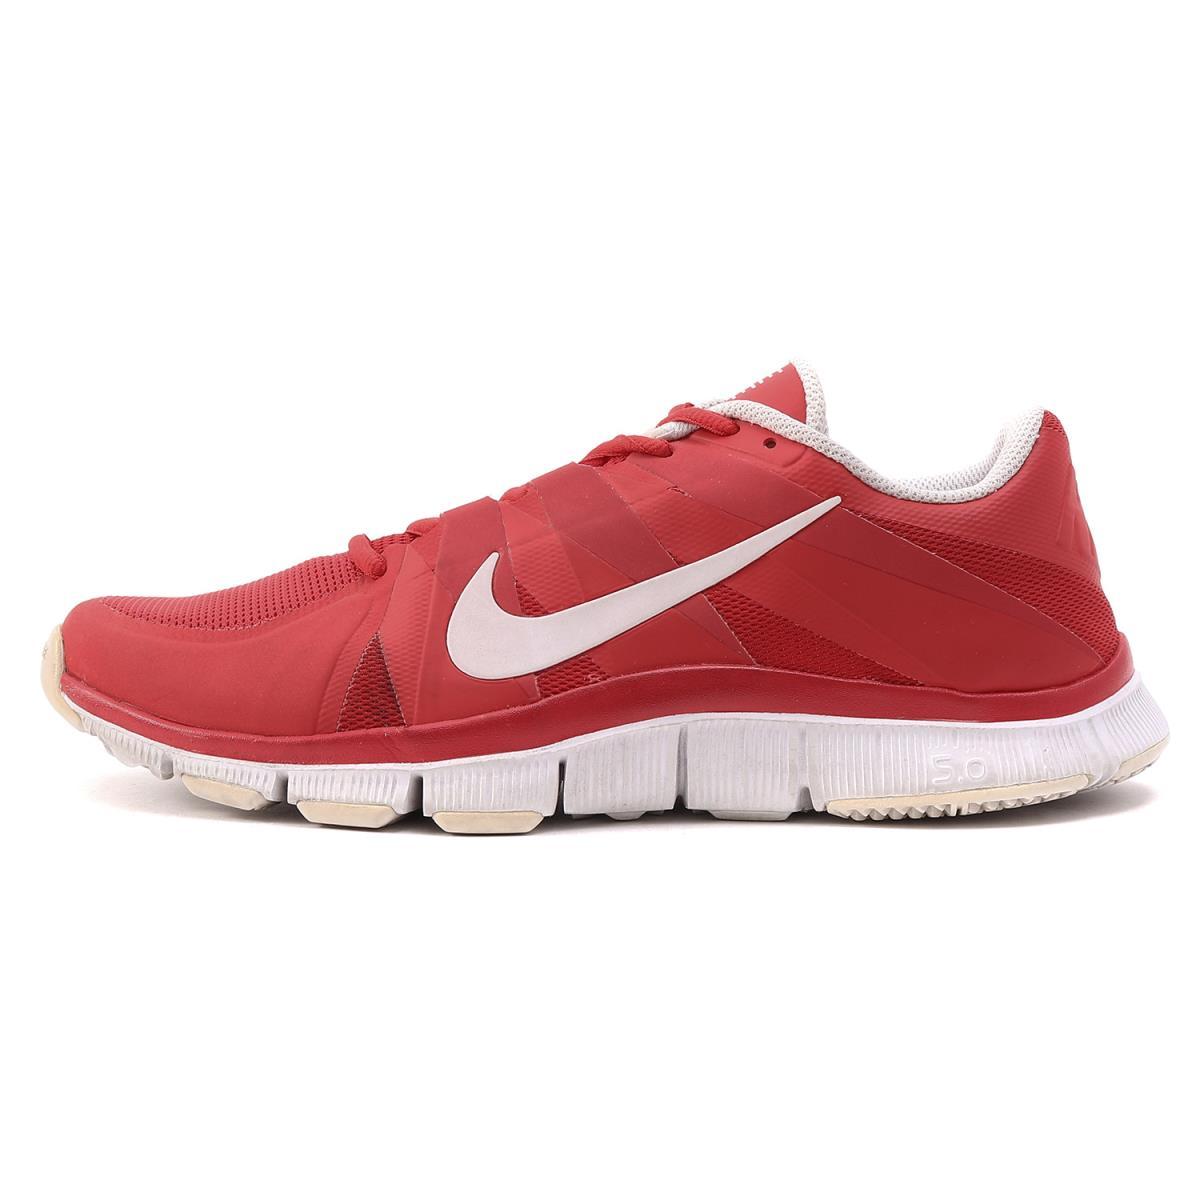 hot sale online a96f9 79280 BEEGLE by Boo-Bee  NIKE (Nike) FREE TRAINER 5.0 (511,018-616) red US8.5(26.5cm)    Rakuten Global Market